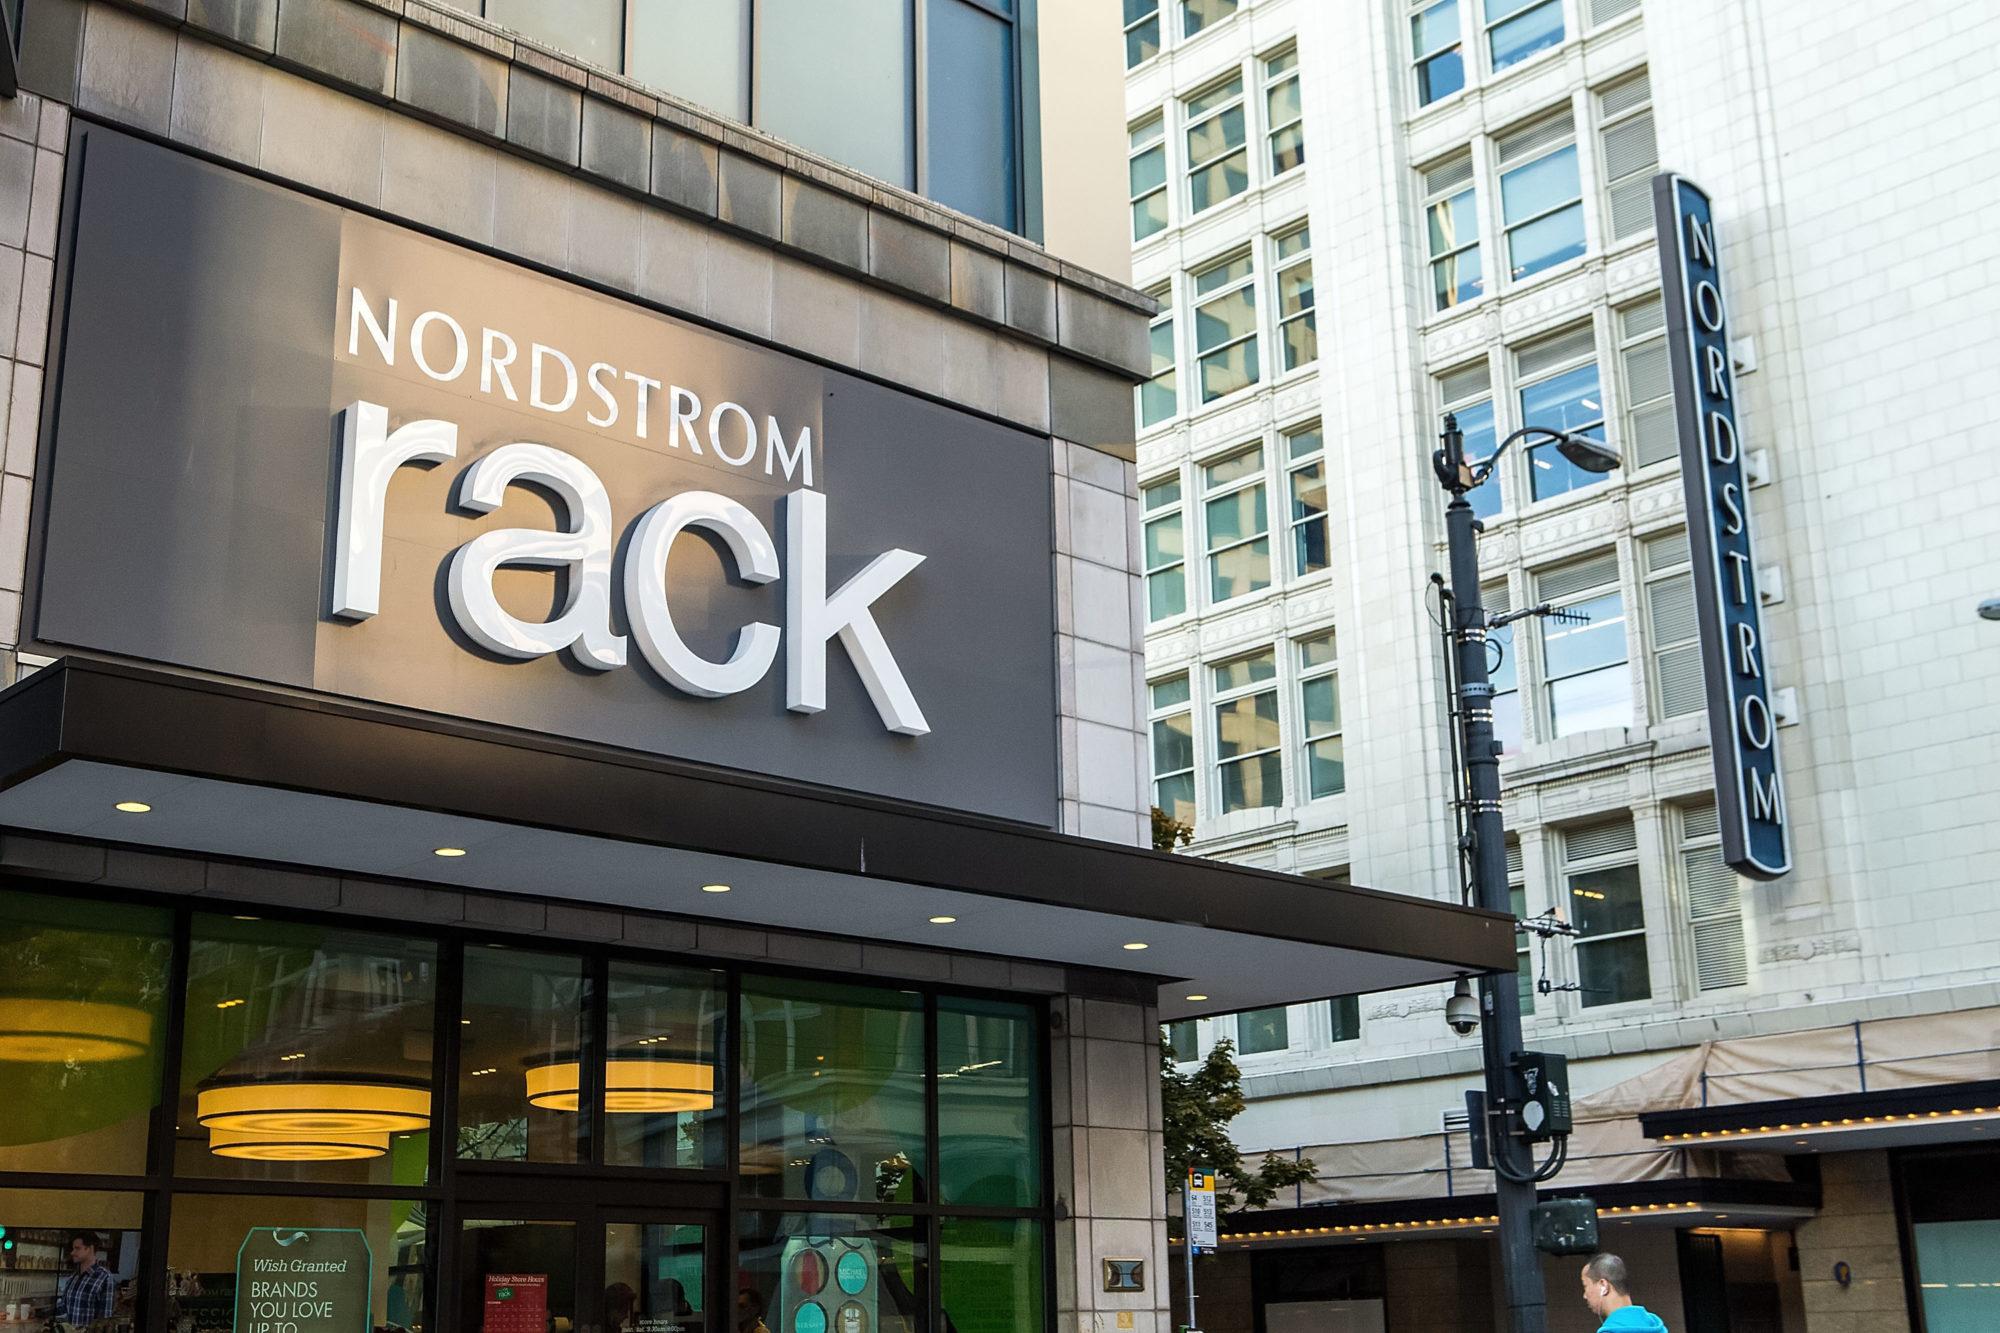 cb6a52da1 Bellevue Nordstrom Rack Slated for Fall 2017 Opening - Vanguard Seattle